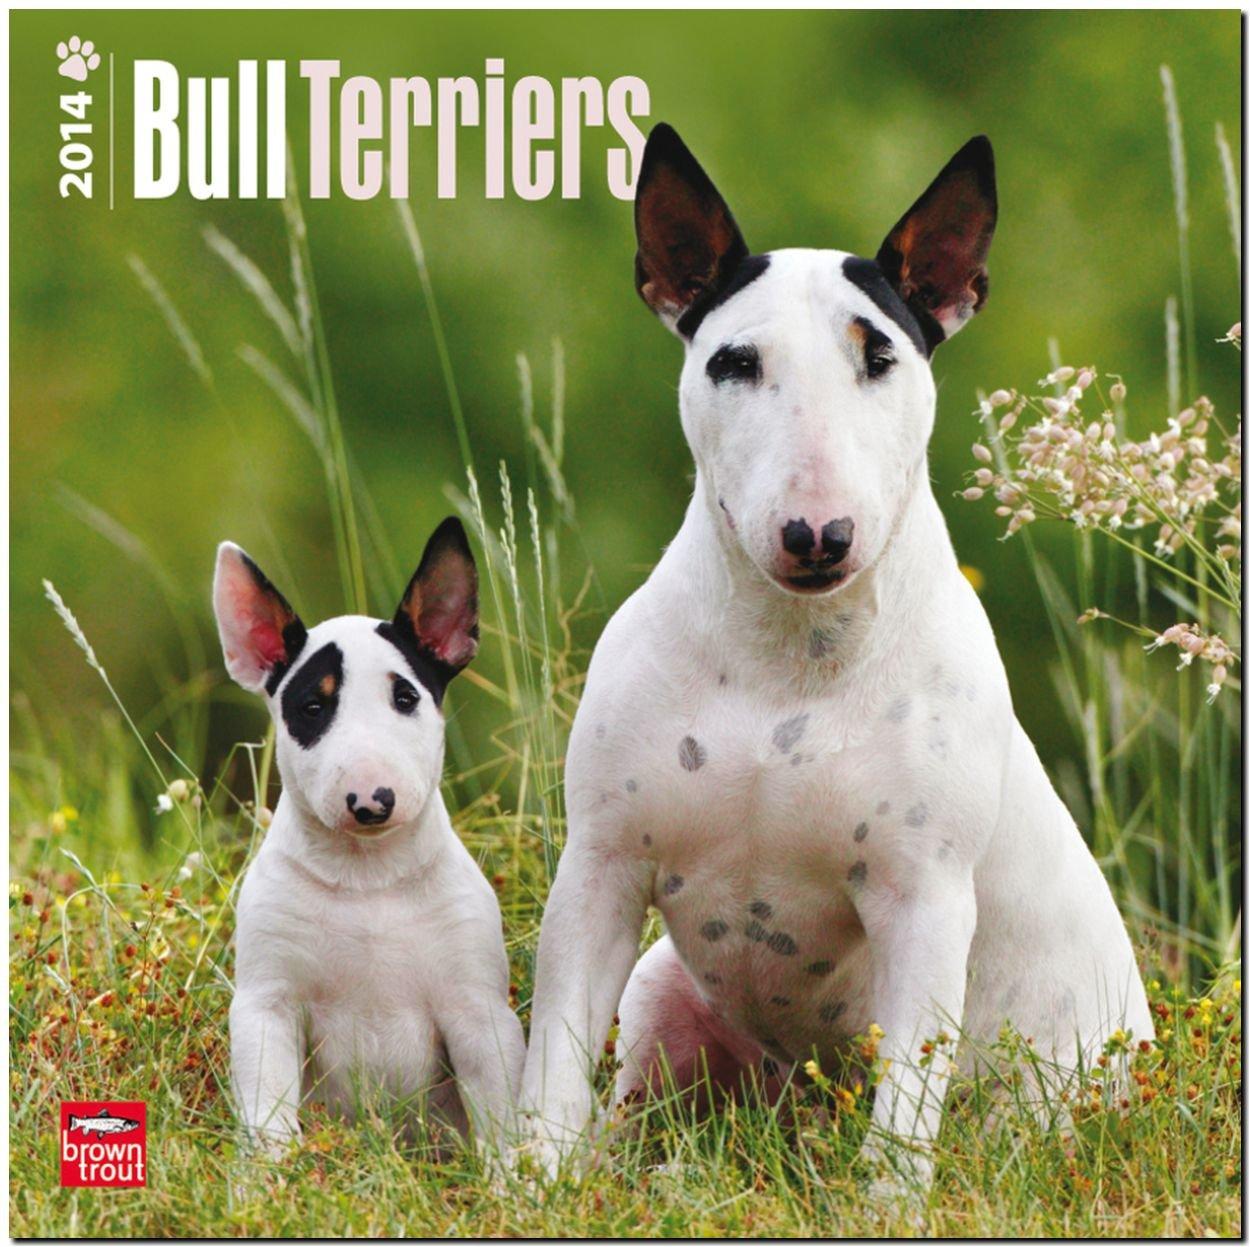 Bull Terriers 2014 - Bull Terrier: Original BrownTrout-Kalender [Mehrsprachig] [Kalender]